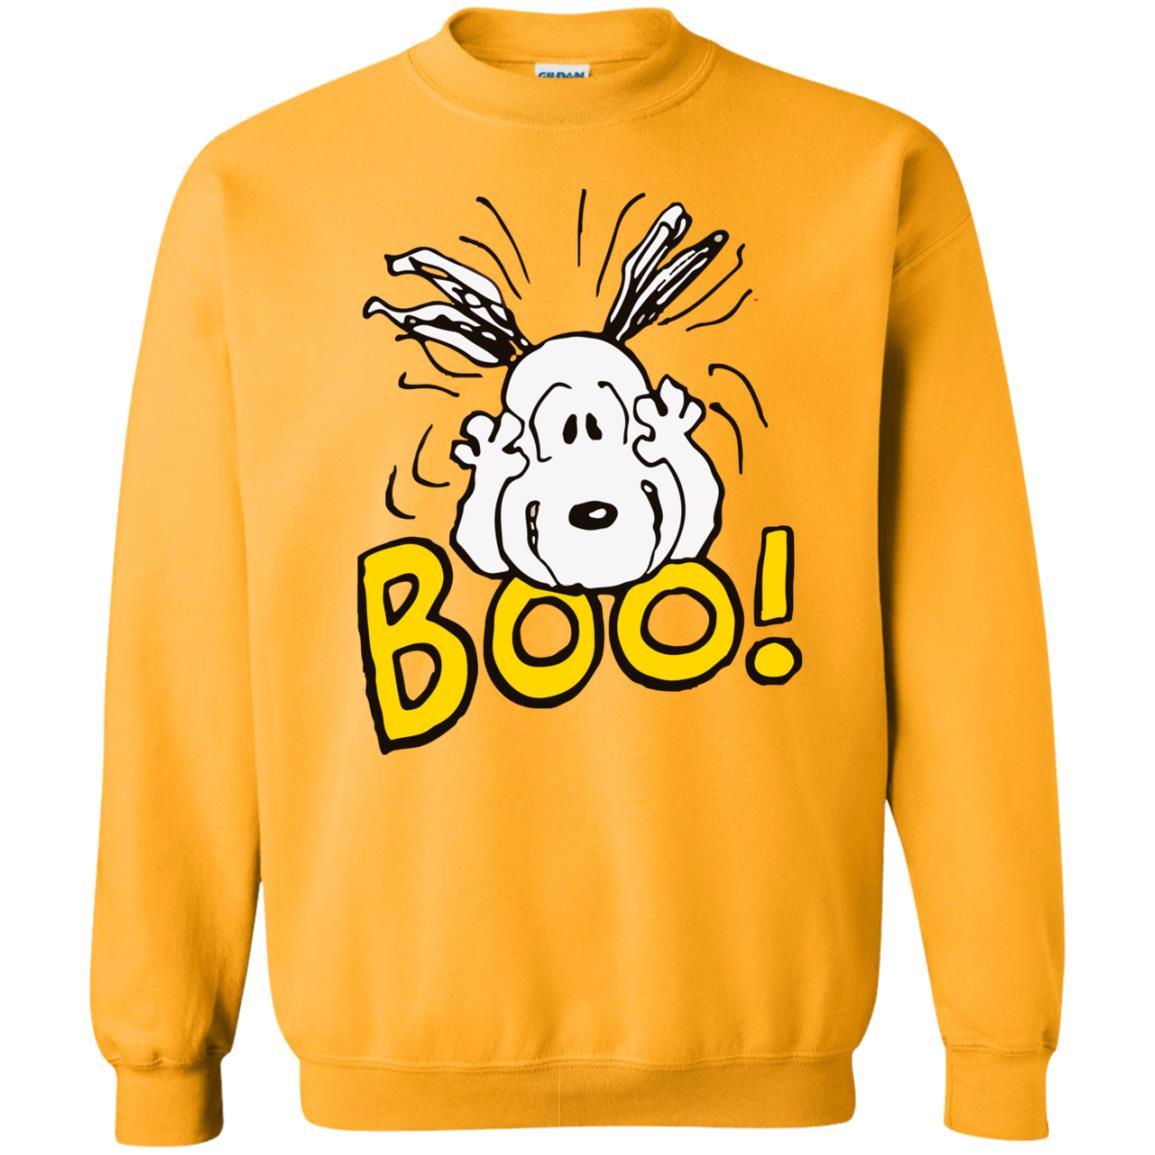 image 2234 - Peanuts Snoopy Halloween Boo shirt, hoodie, tank